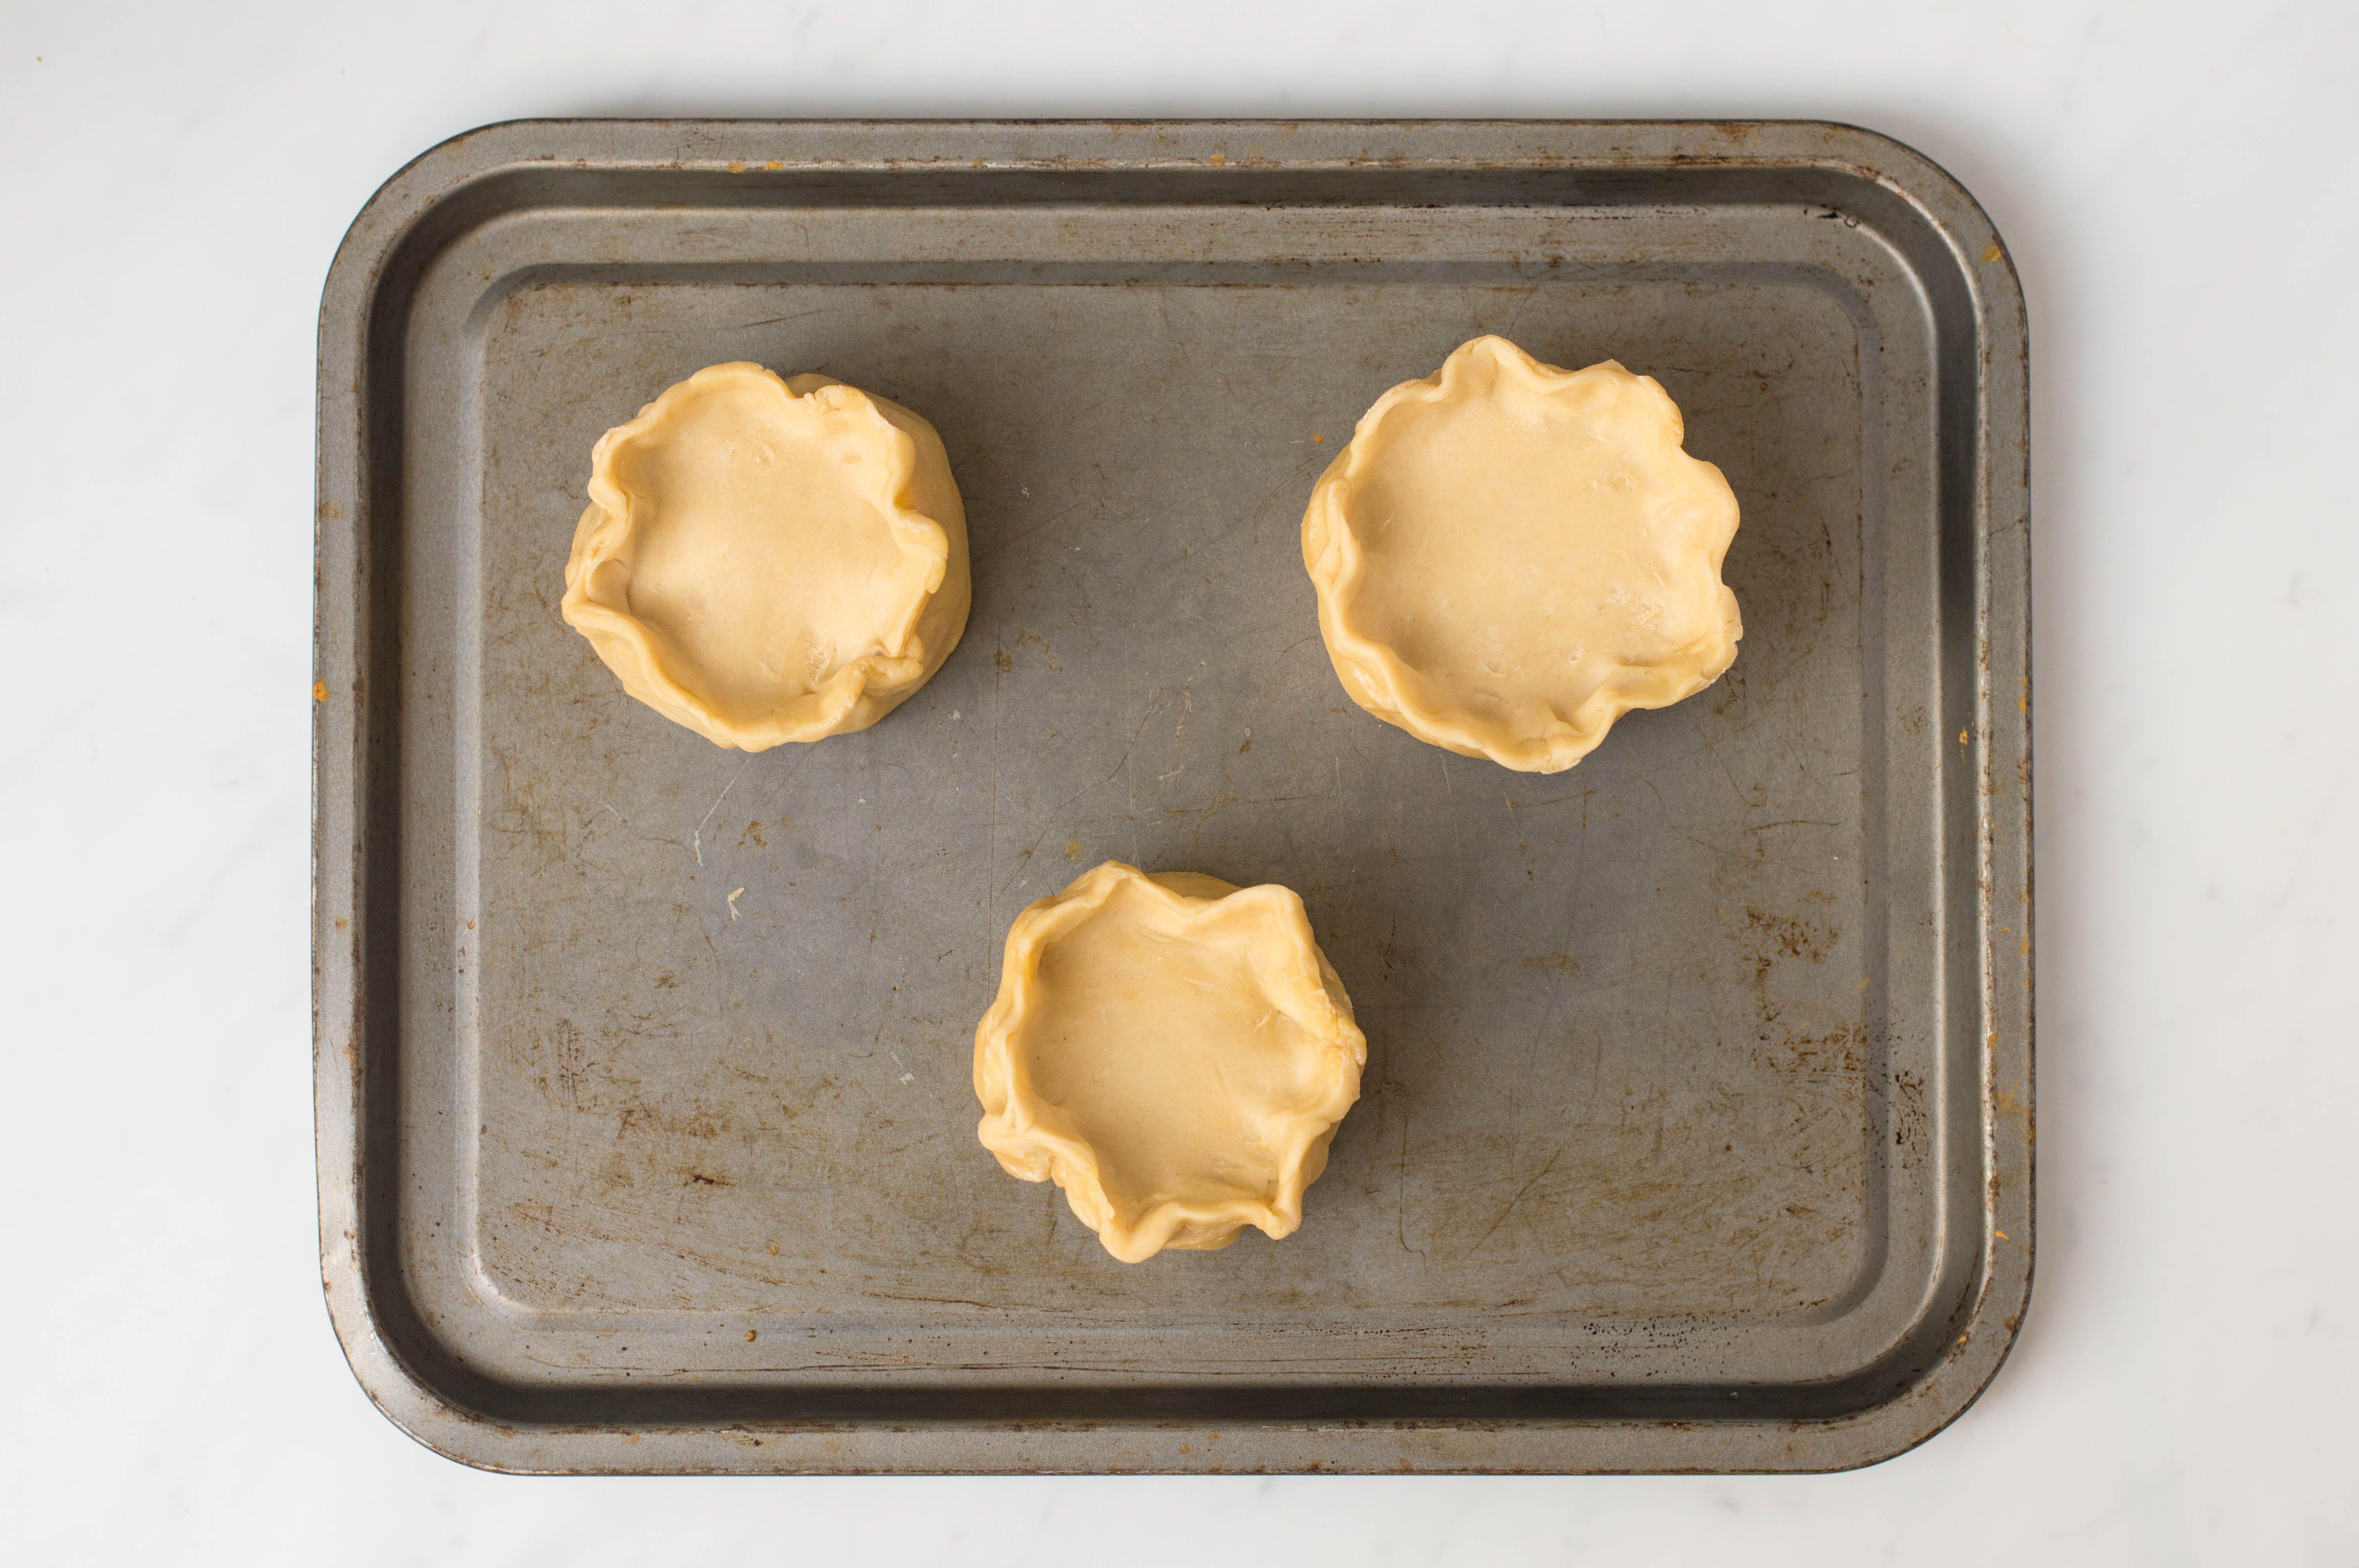 Crimp pastry edges